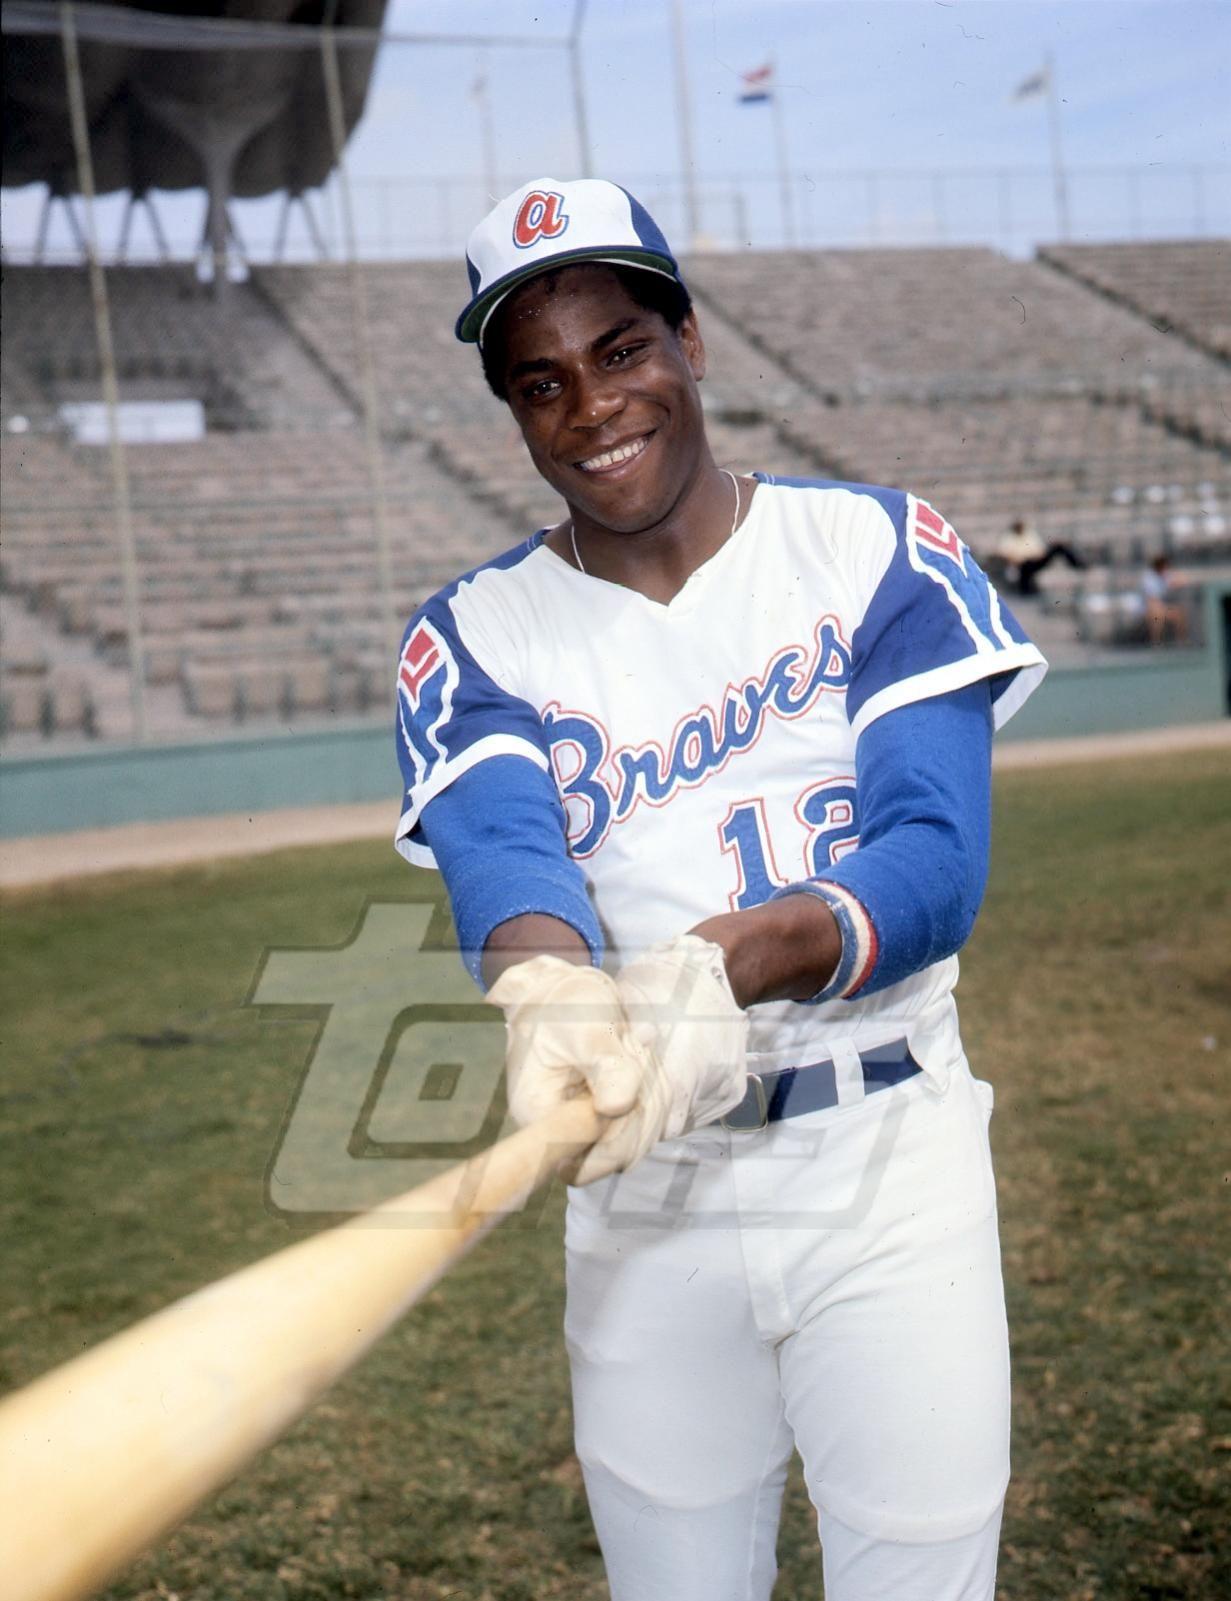 Dusty Baker Atlanta Braves Braves Sports Baseball